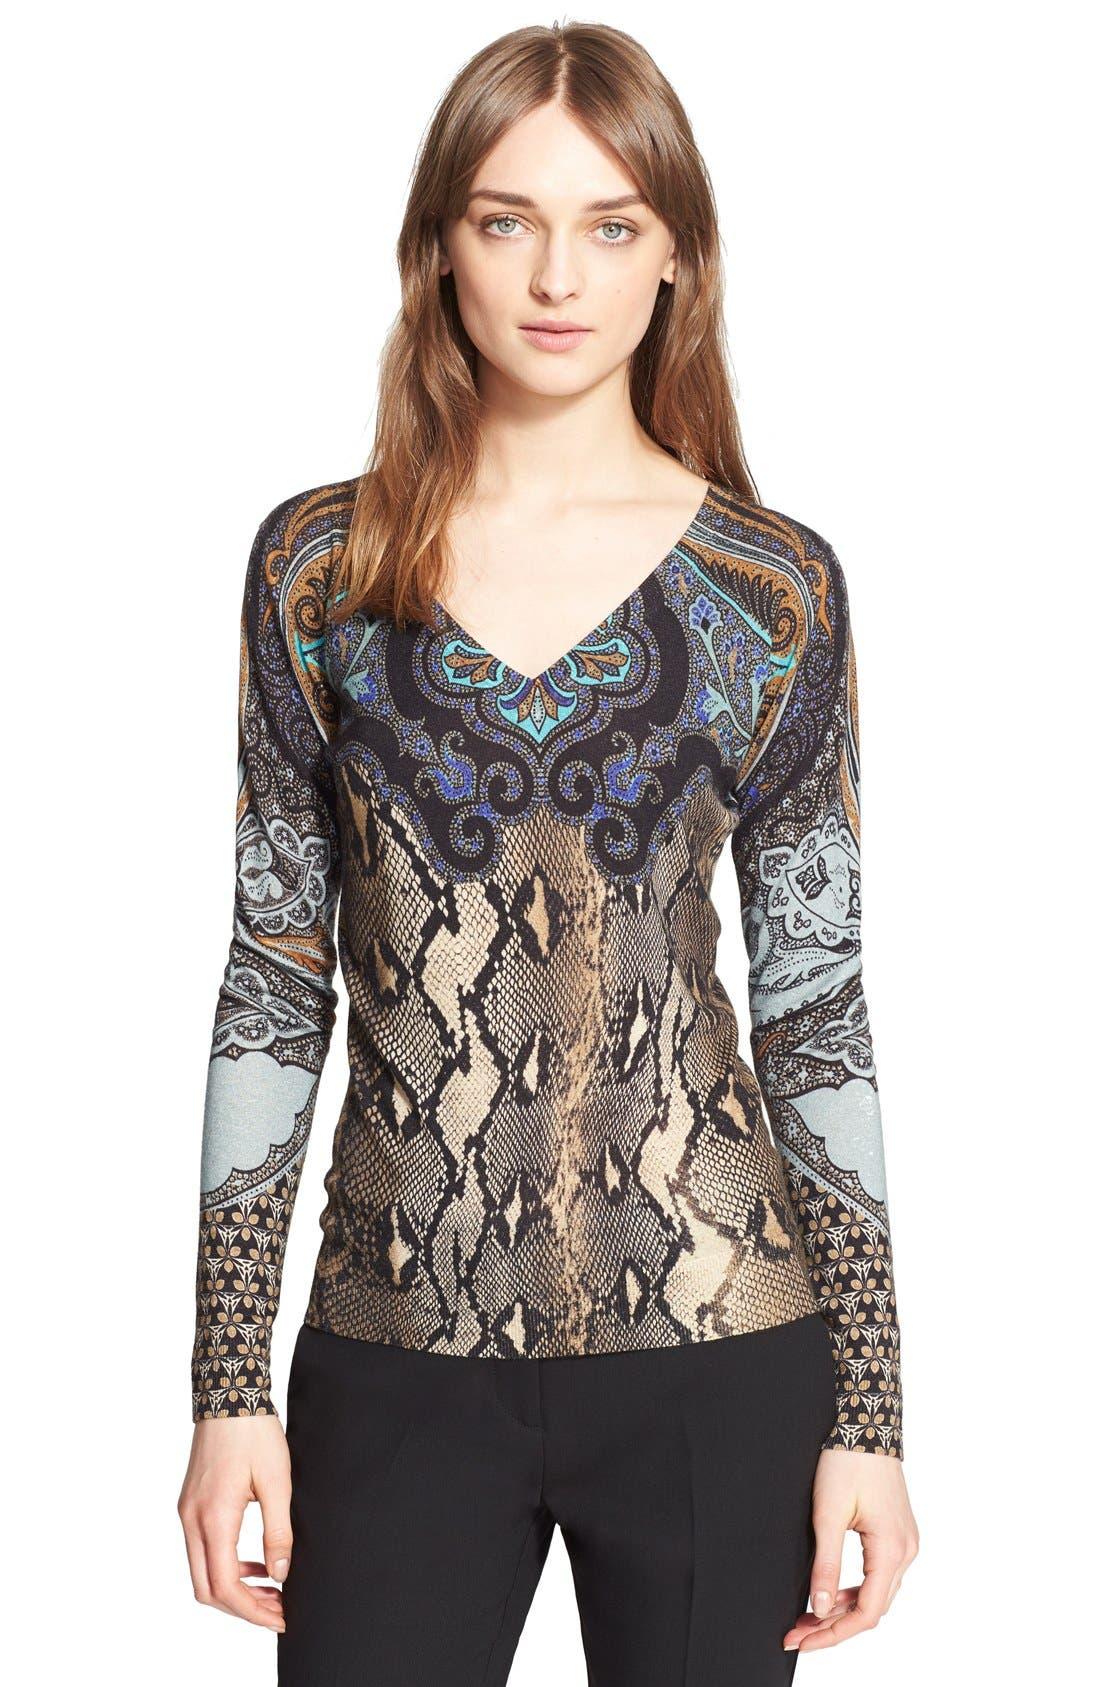 Alternate Image 1 Selected - Etro Python Print Silk & Cashmere Sweater